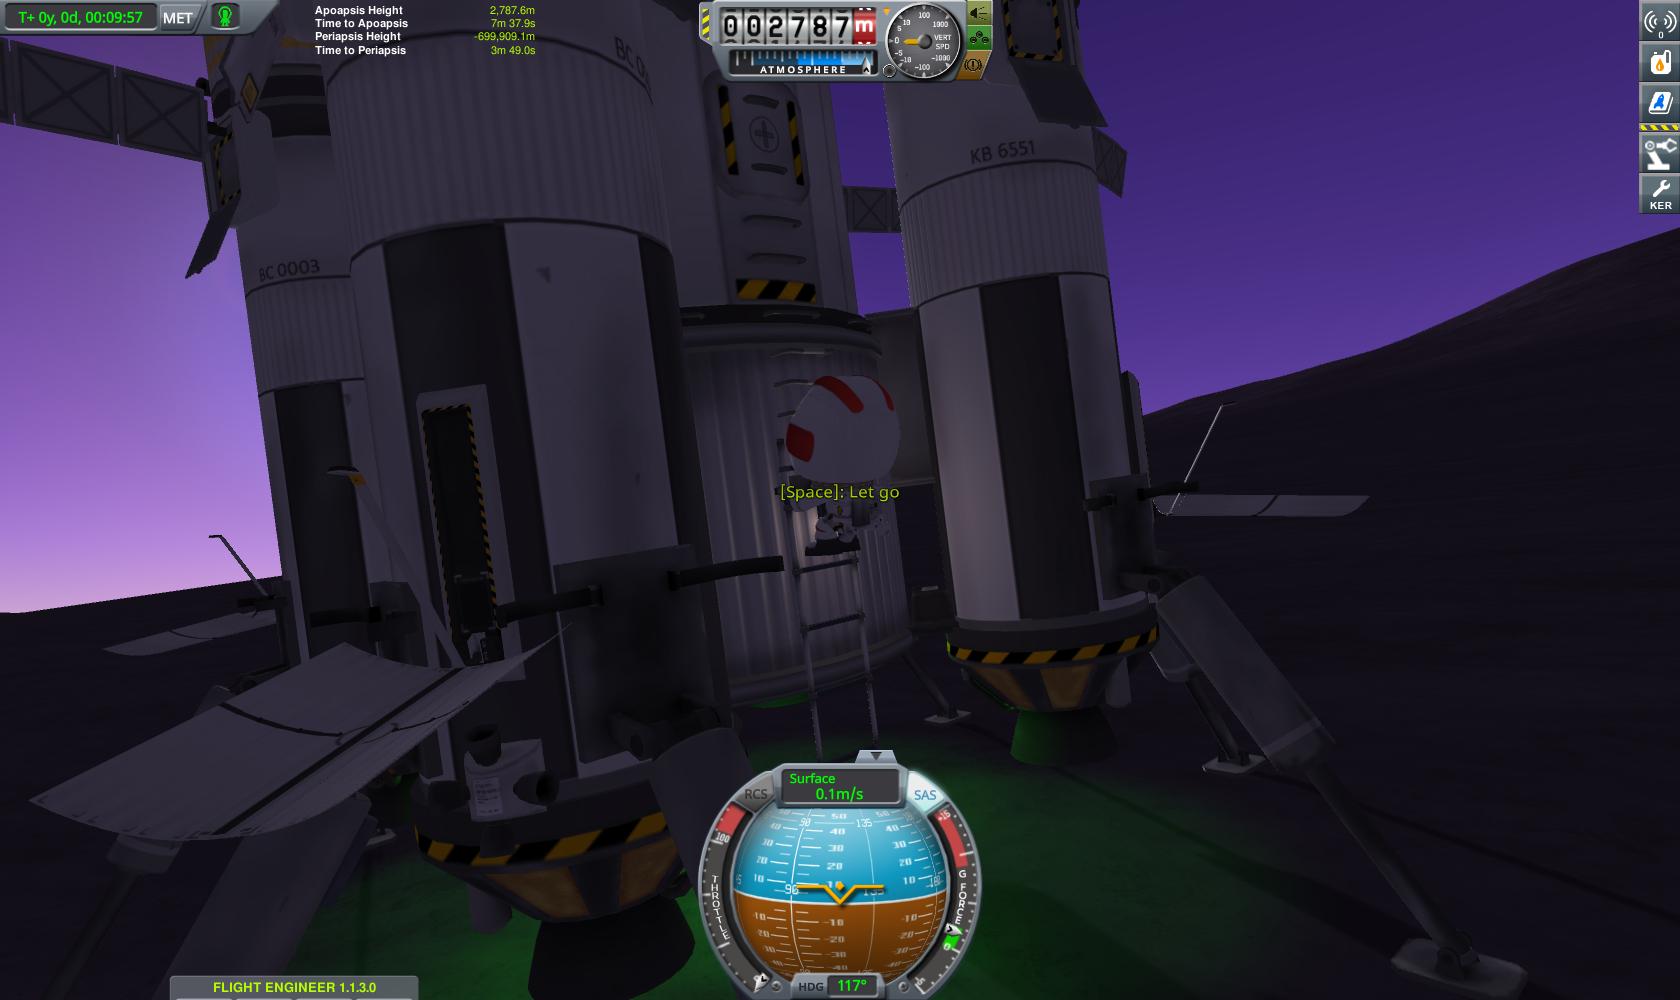 screenshot174.png